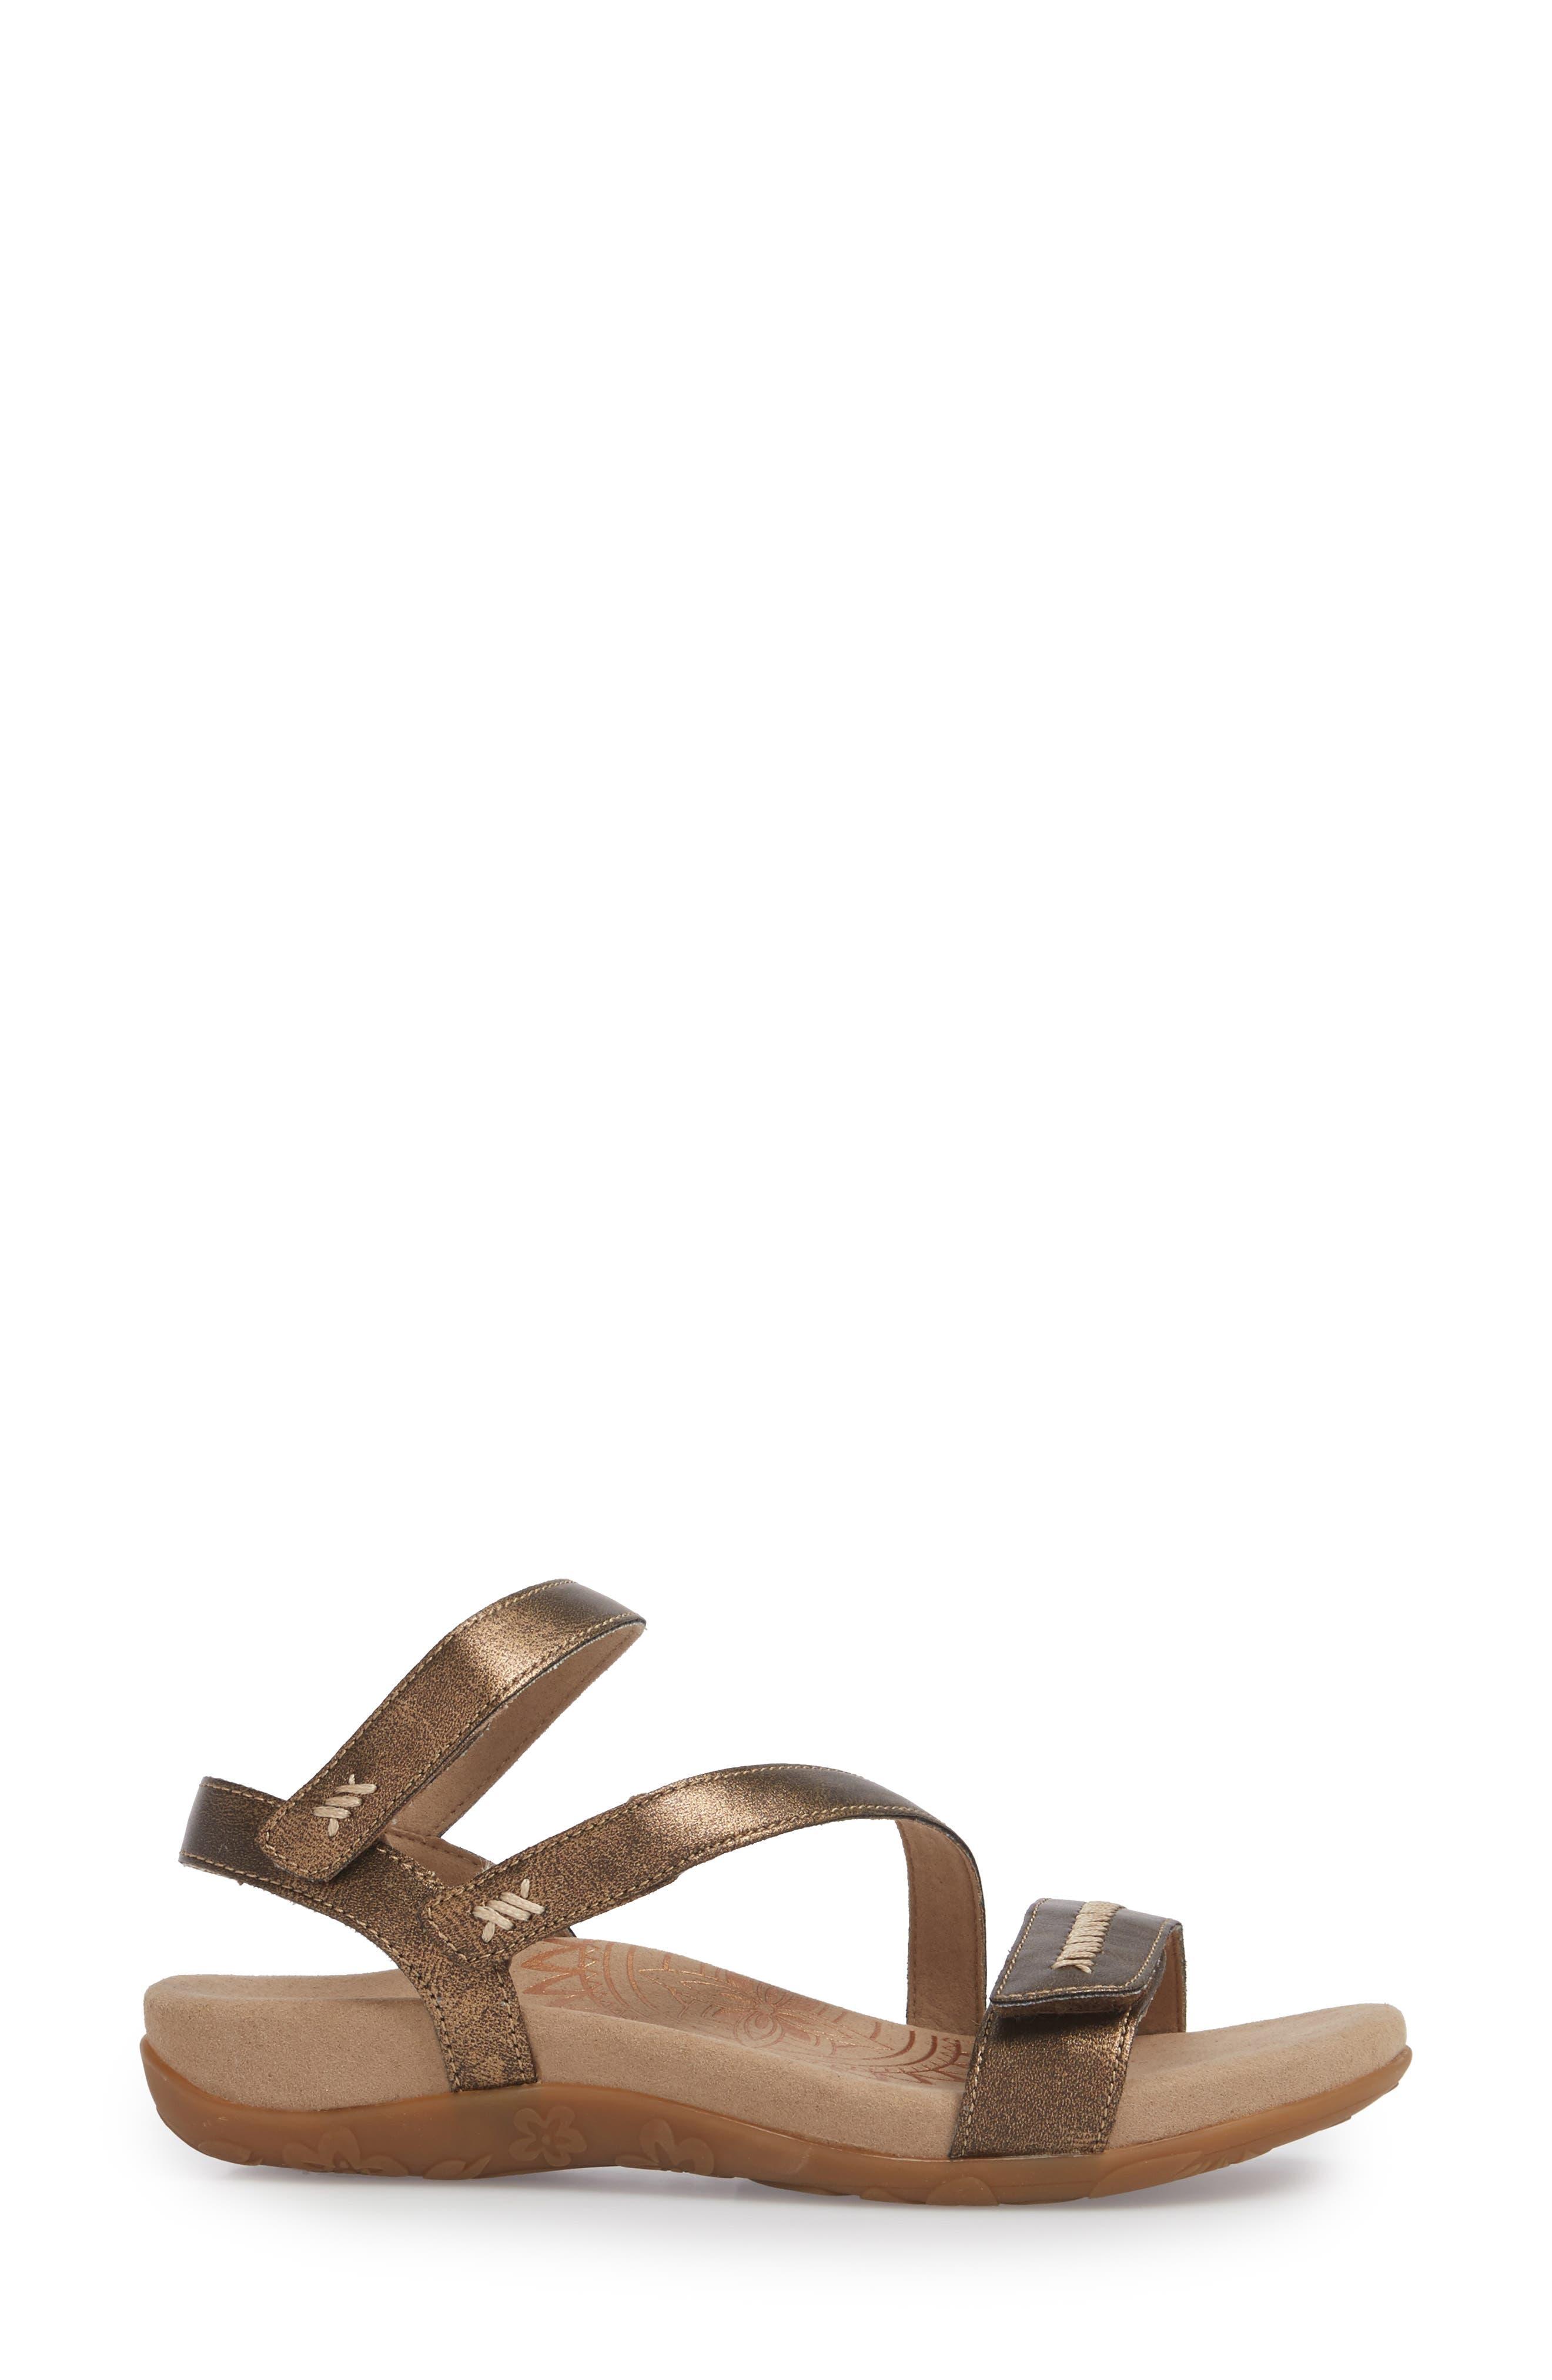 Gabby Sandal,                             Alternate thumbnail 3, color,                             Bronze Leather